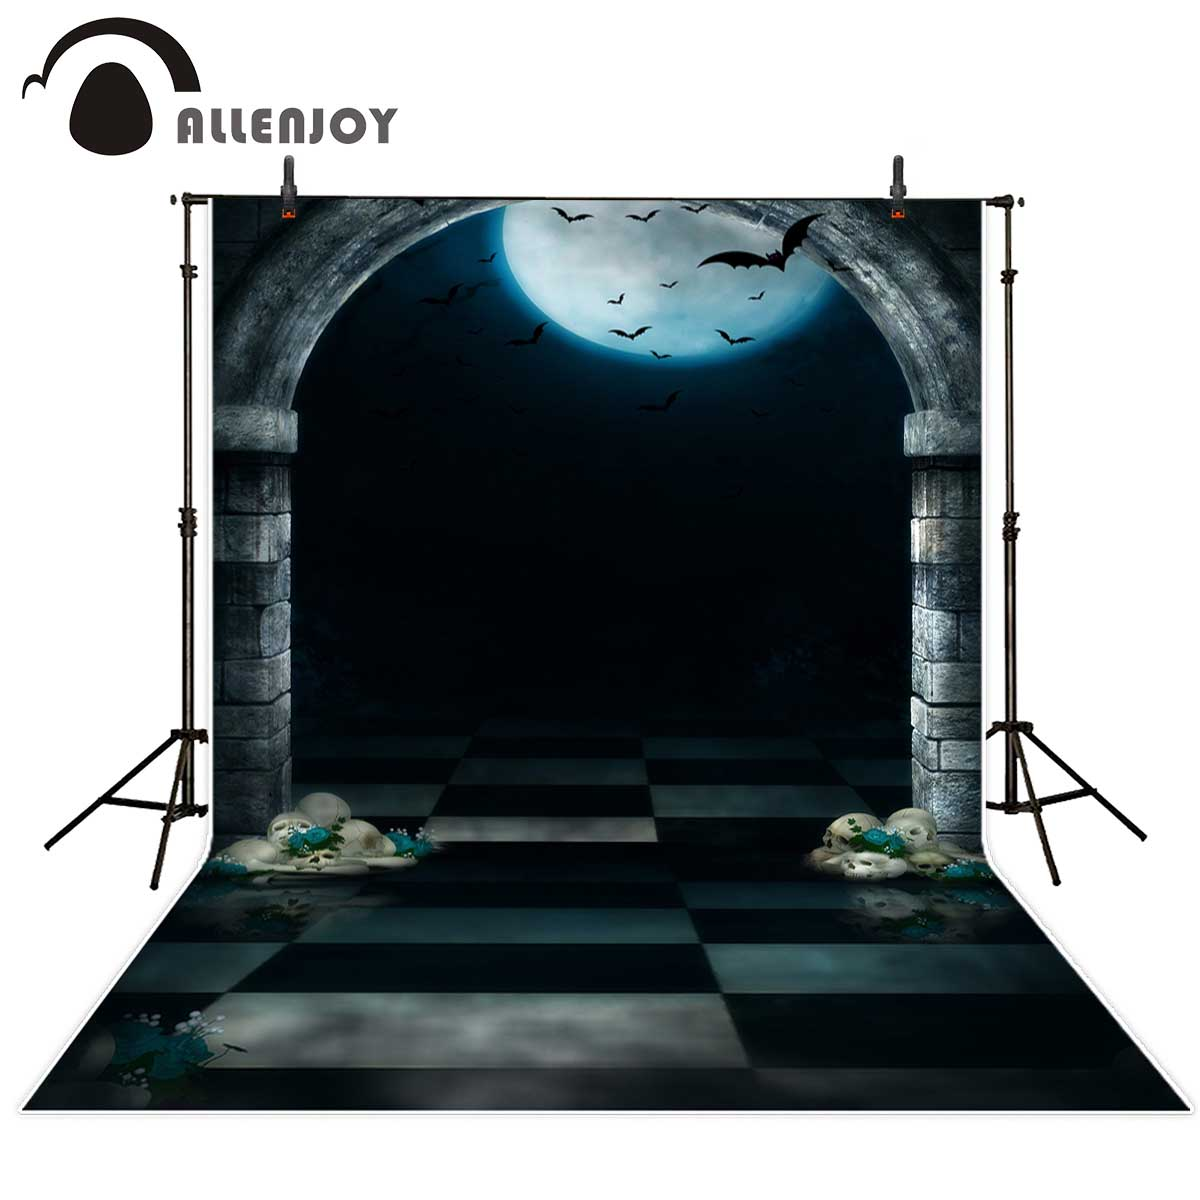 Allenjoy Halloween backdrop Bats Arches Skeleton Moon Night photographic background vinyl backdrops for photography